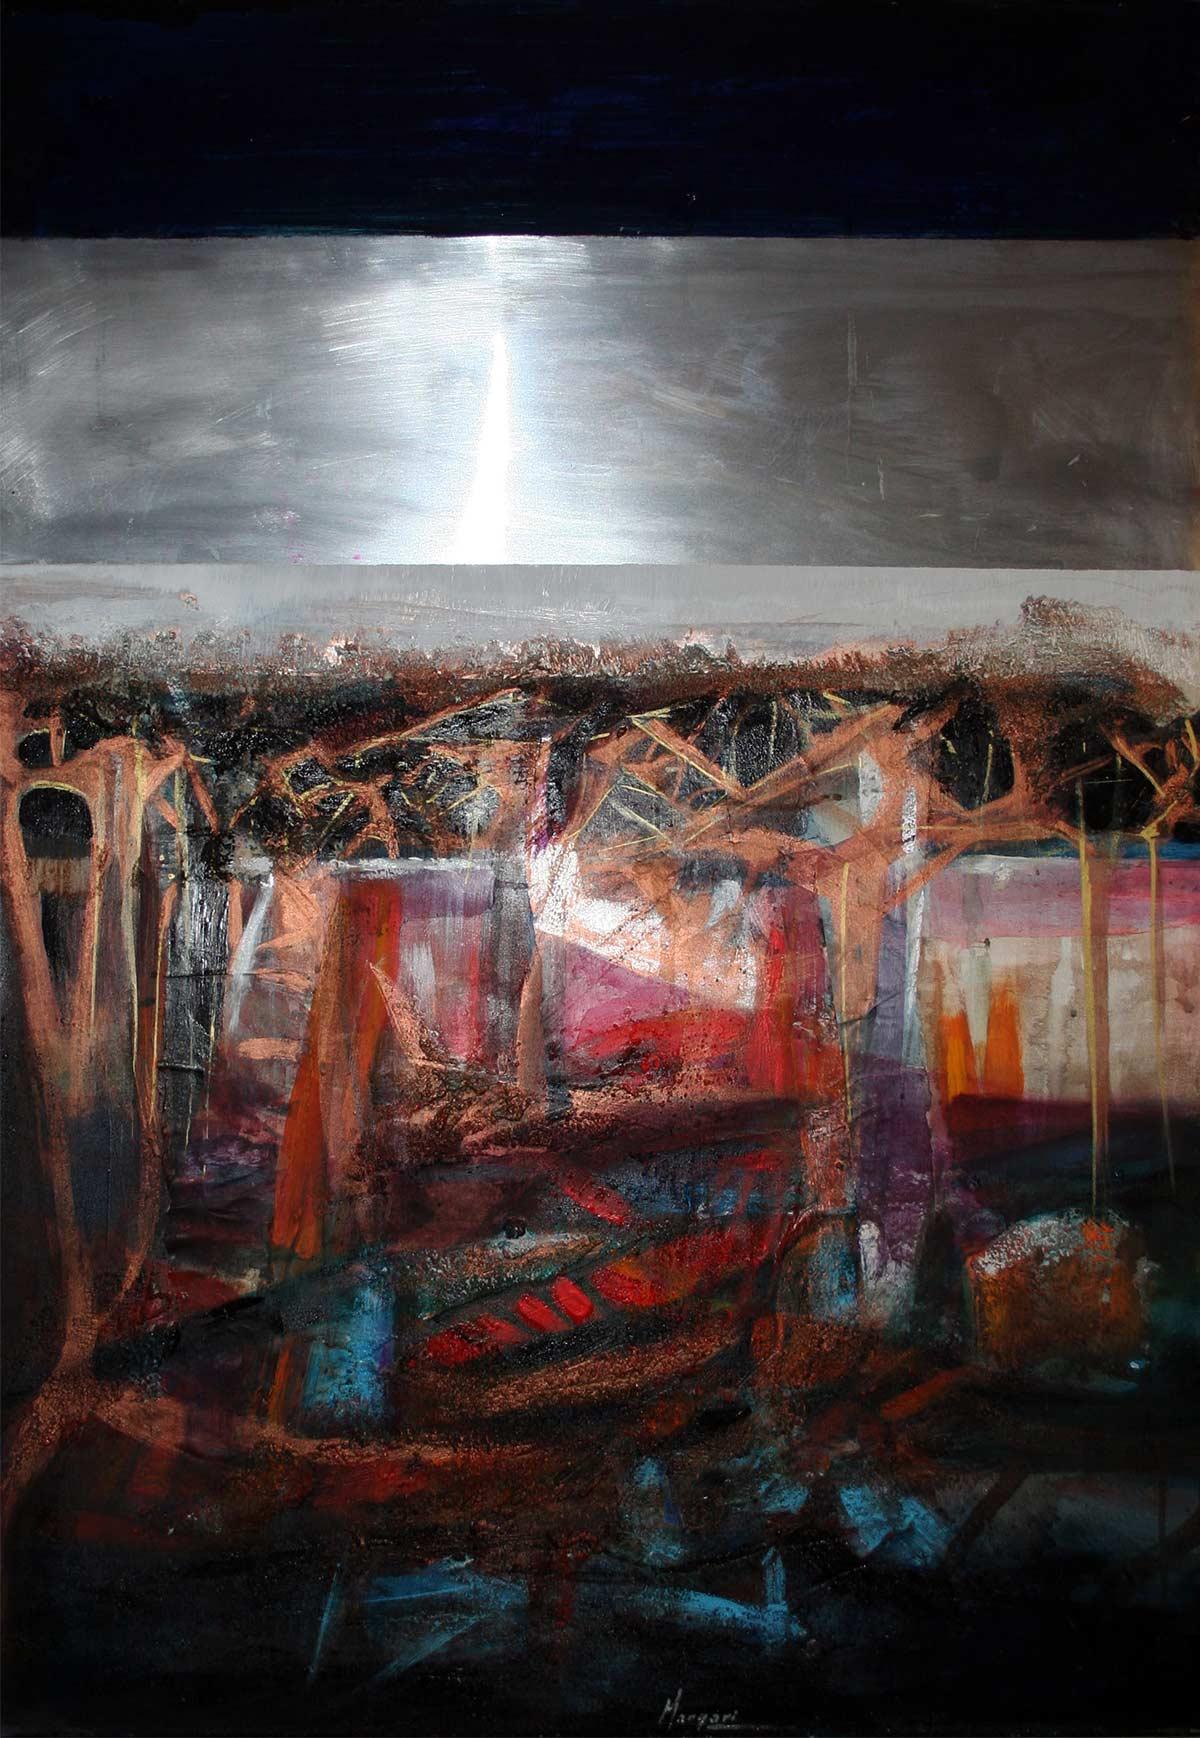 Orizzonti inattesi - Franco Margari - Pittura